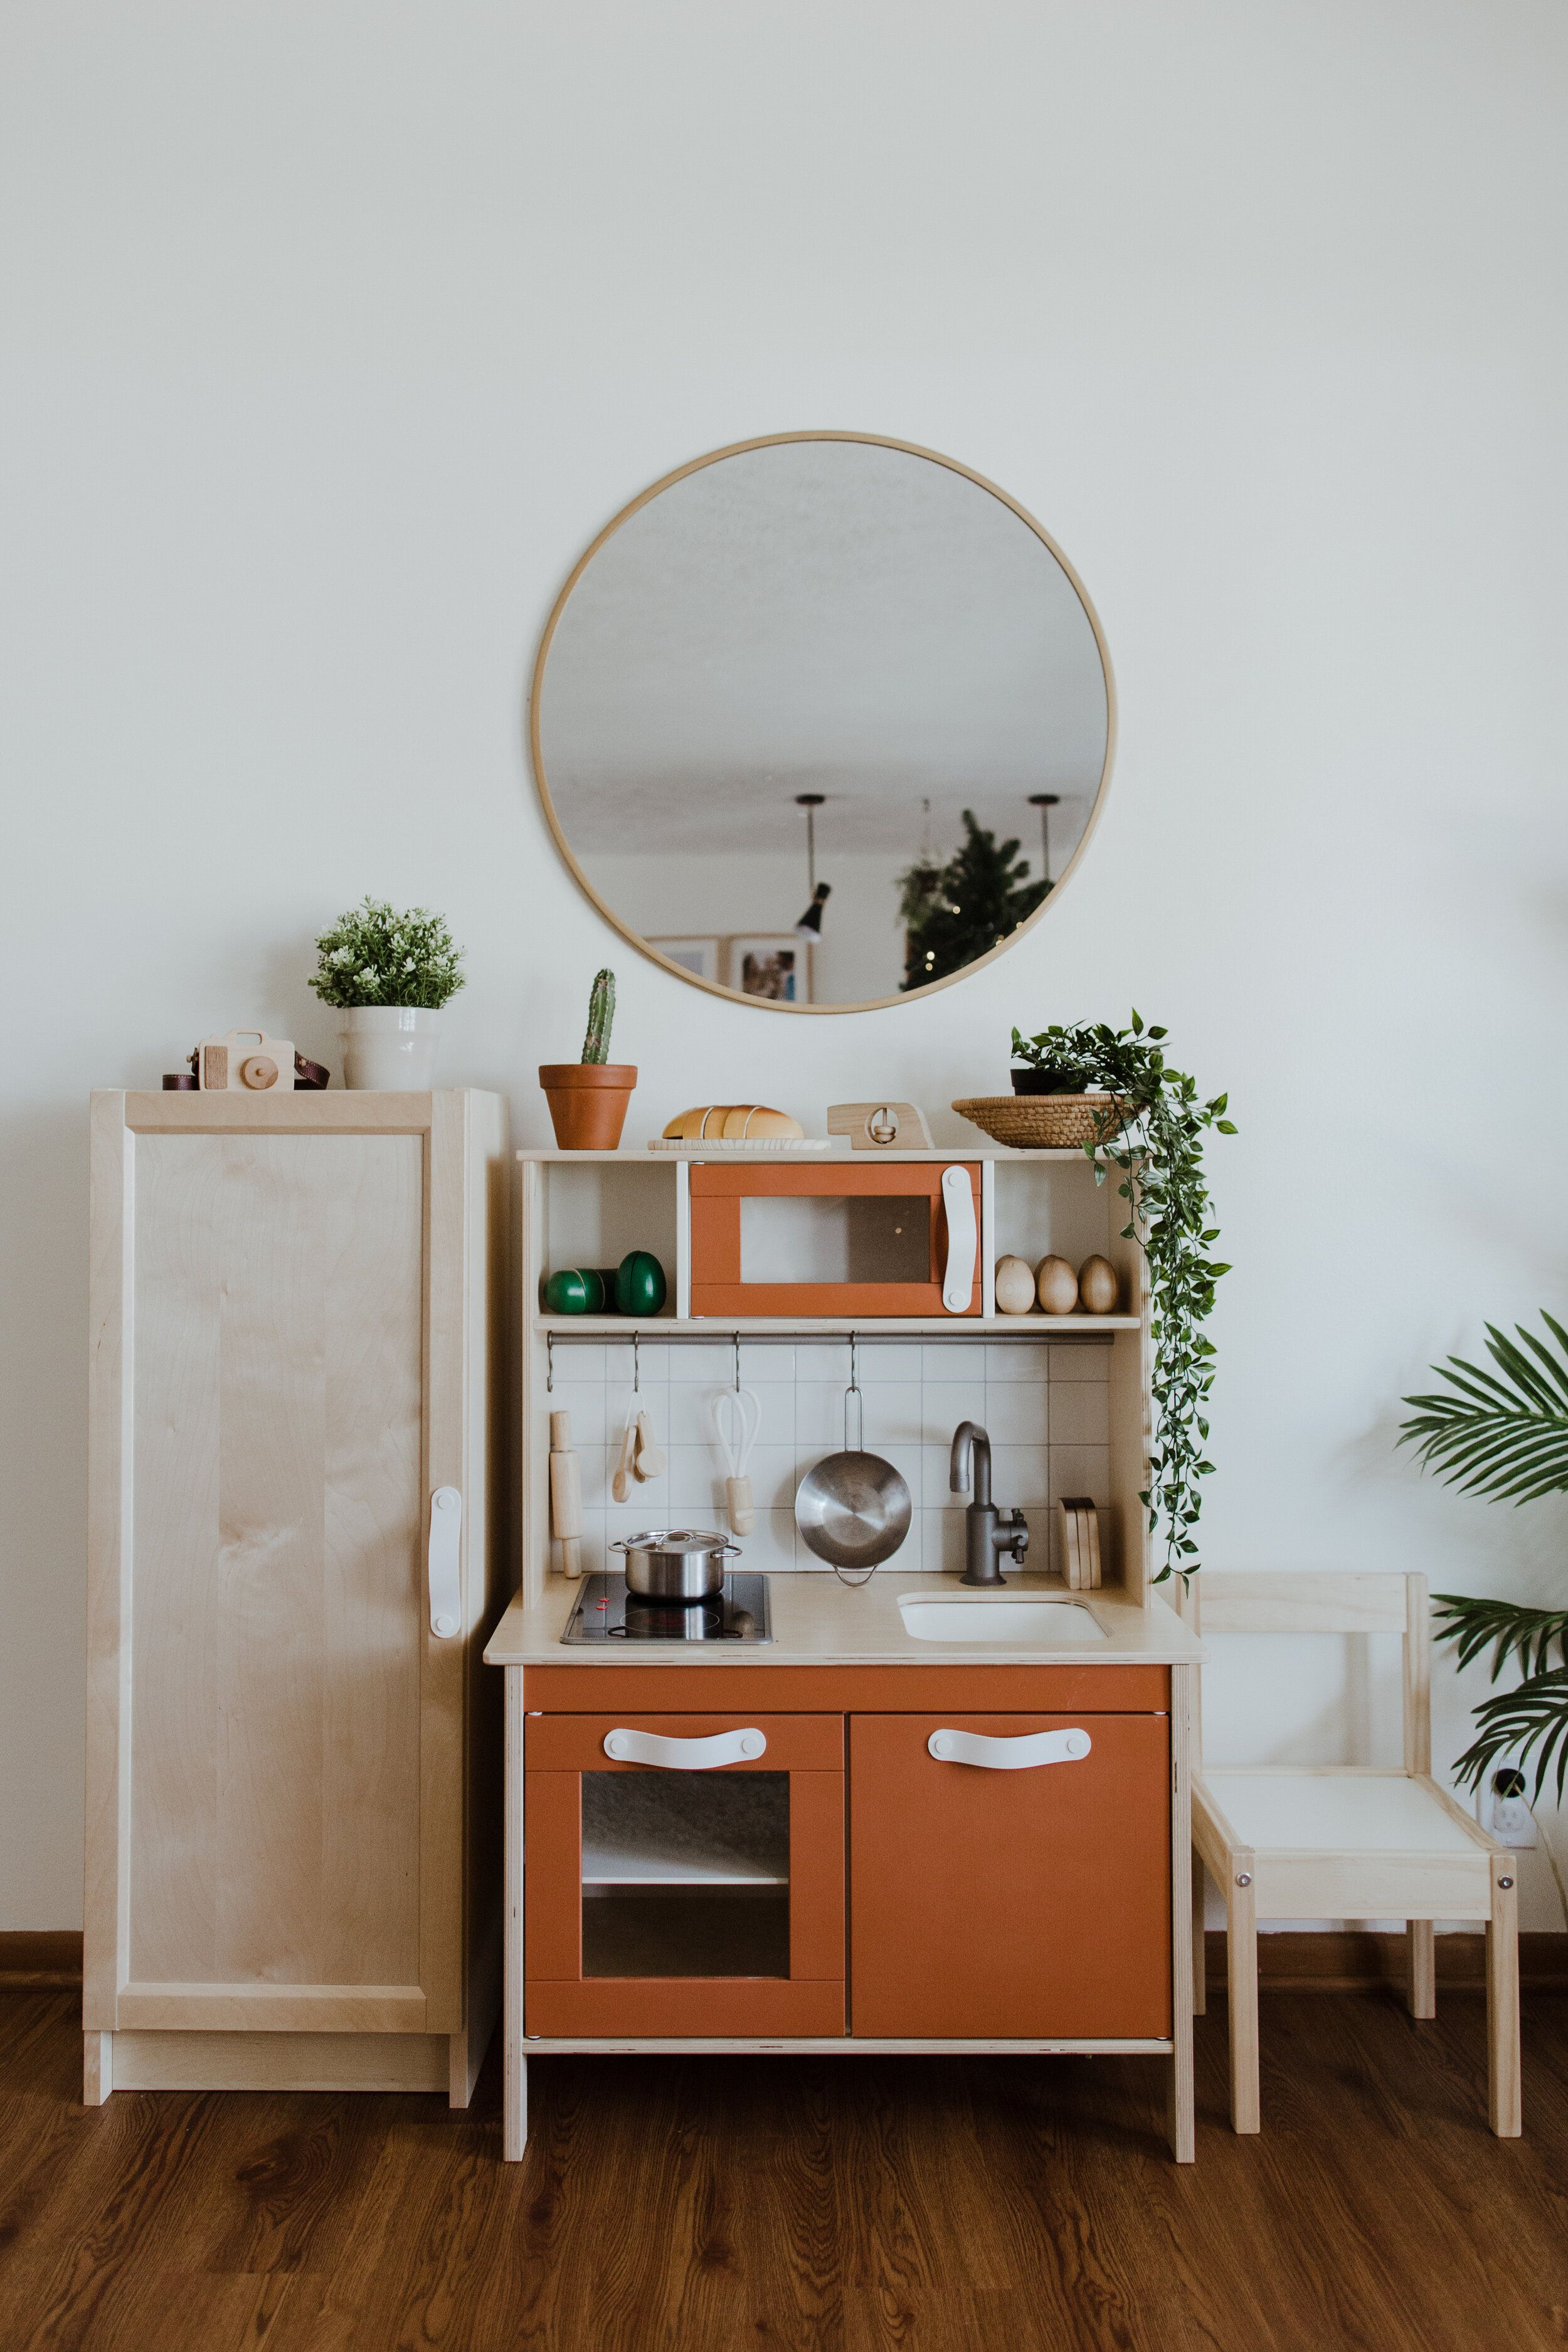 IKEA DUKTIG PLAY KITCHEN MAKEOVER + REFRIGERATOR HACK in